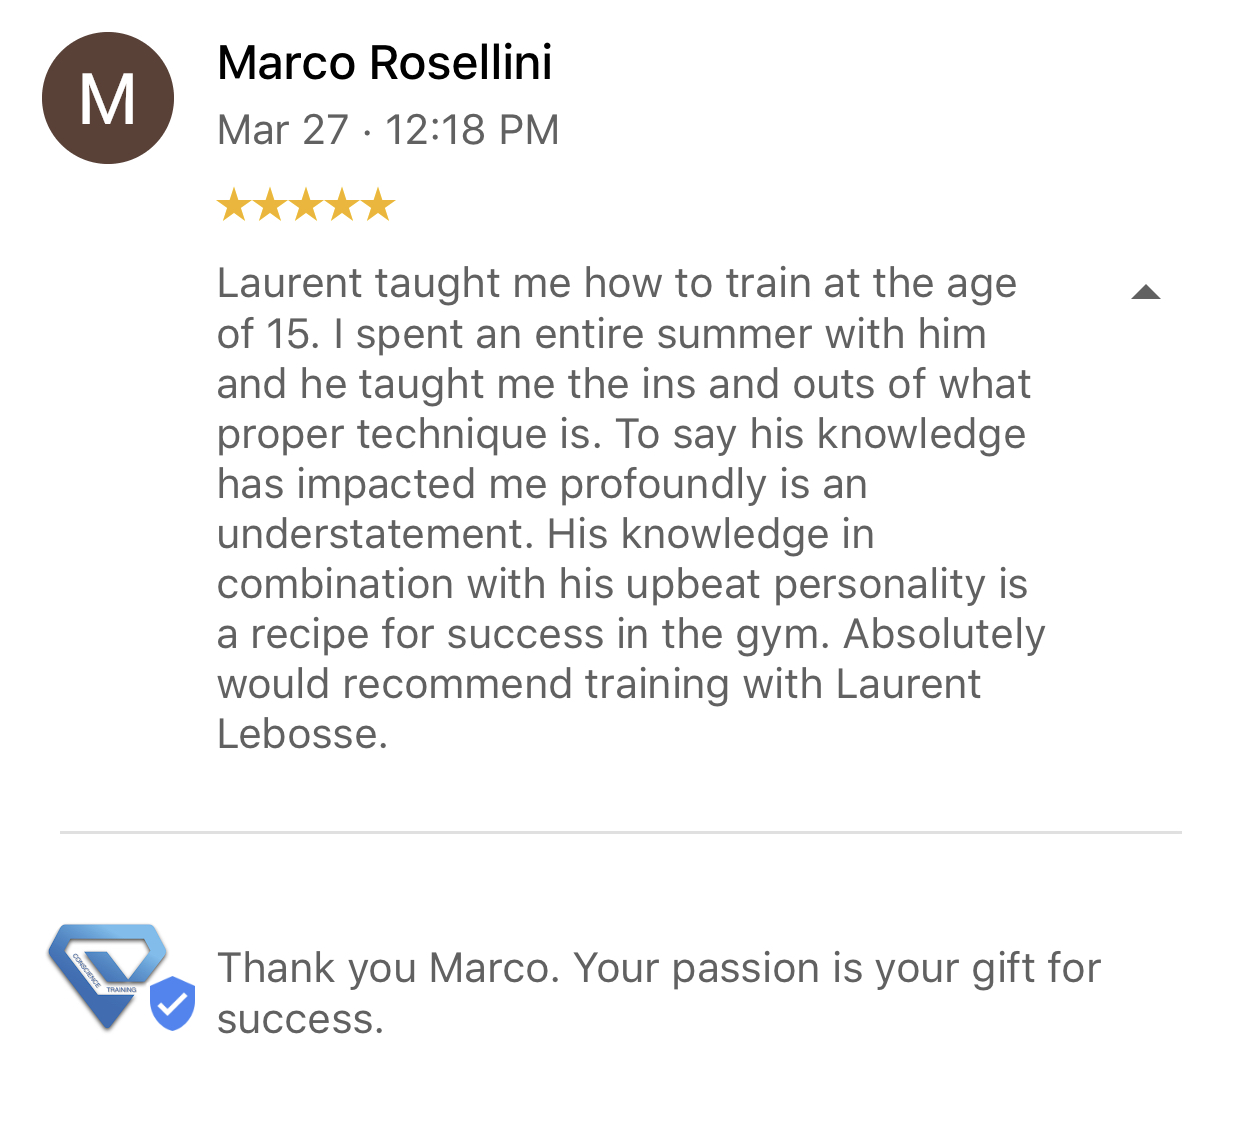 Marco Rosellini